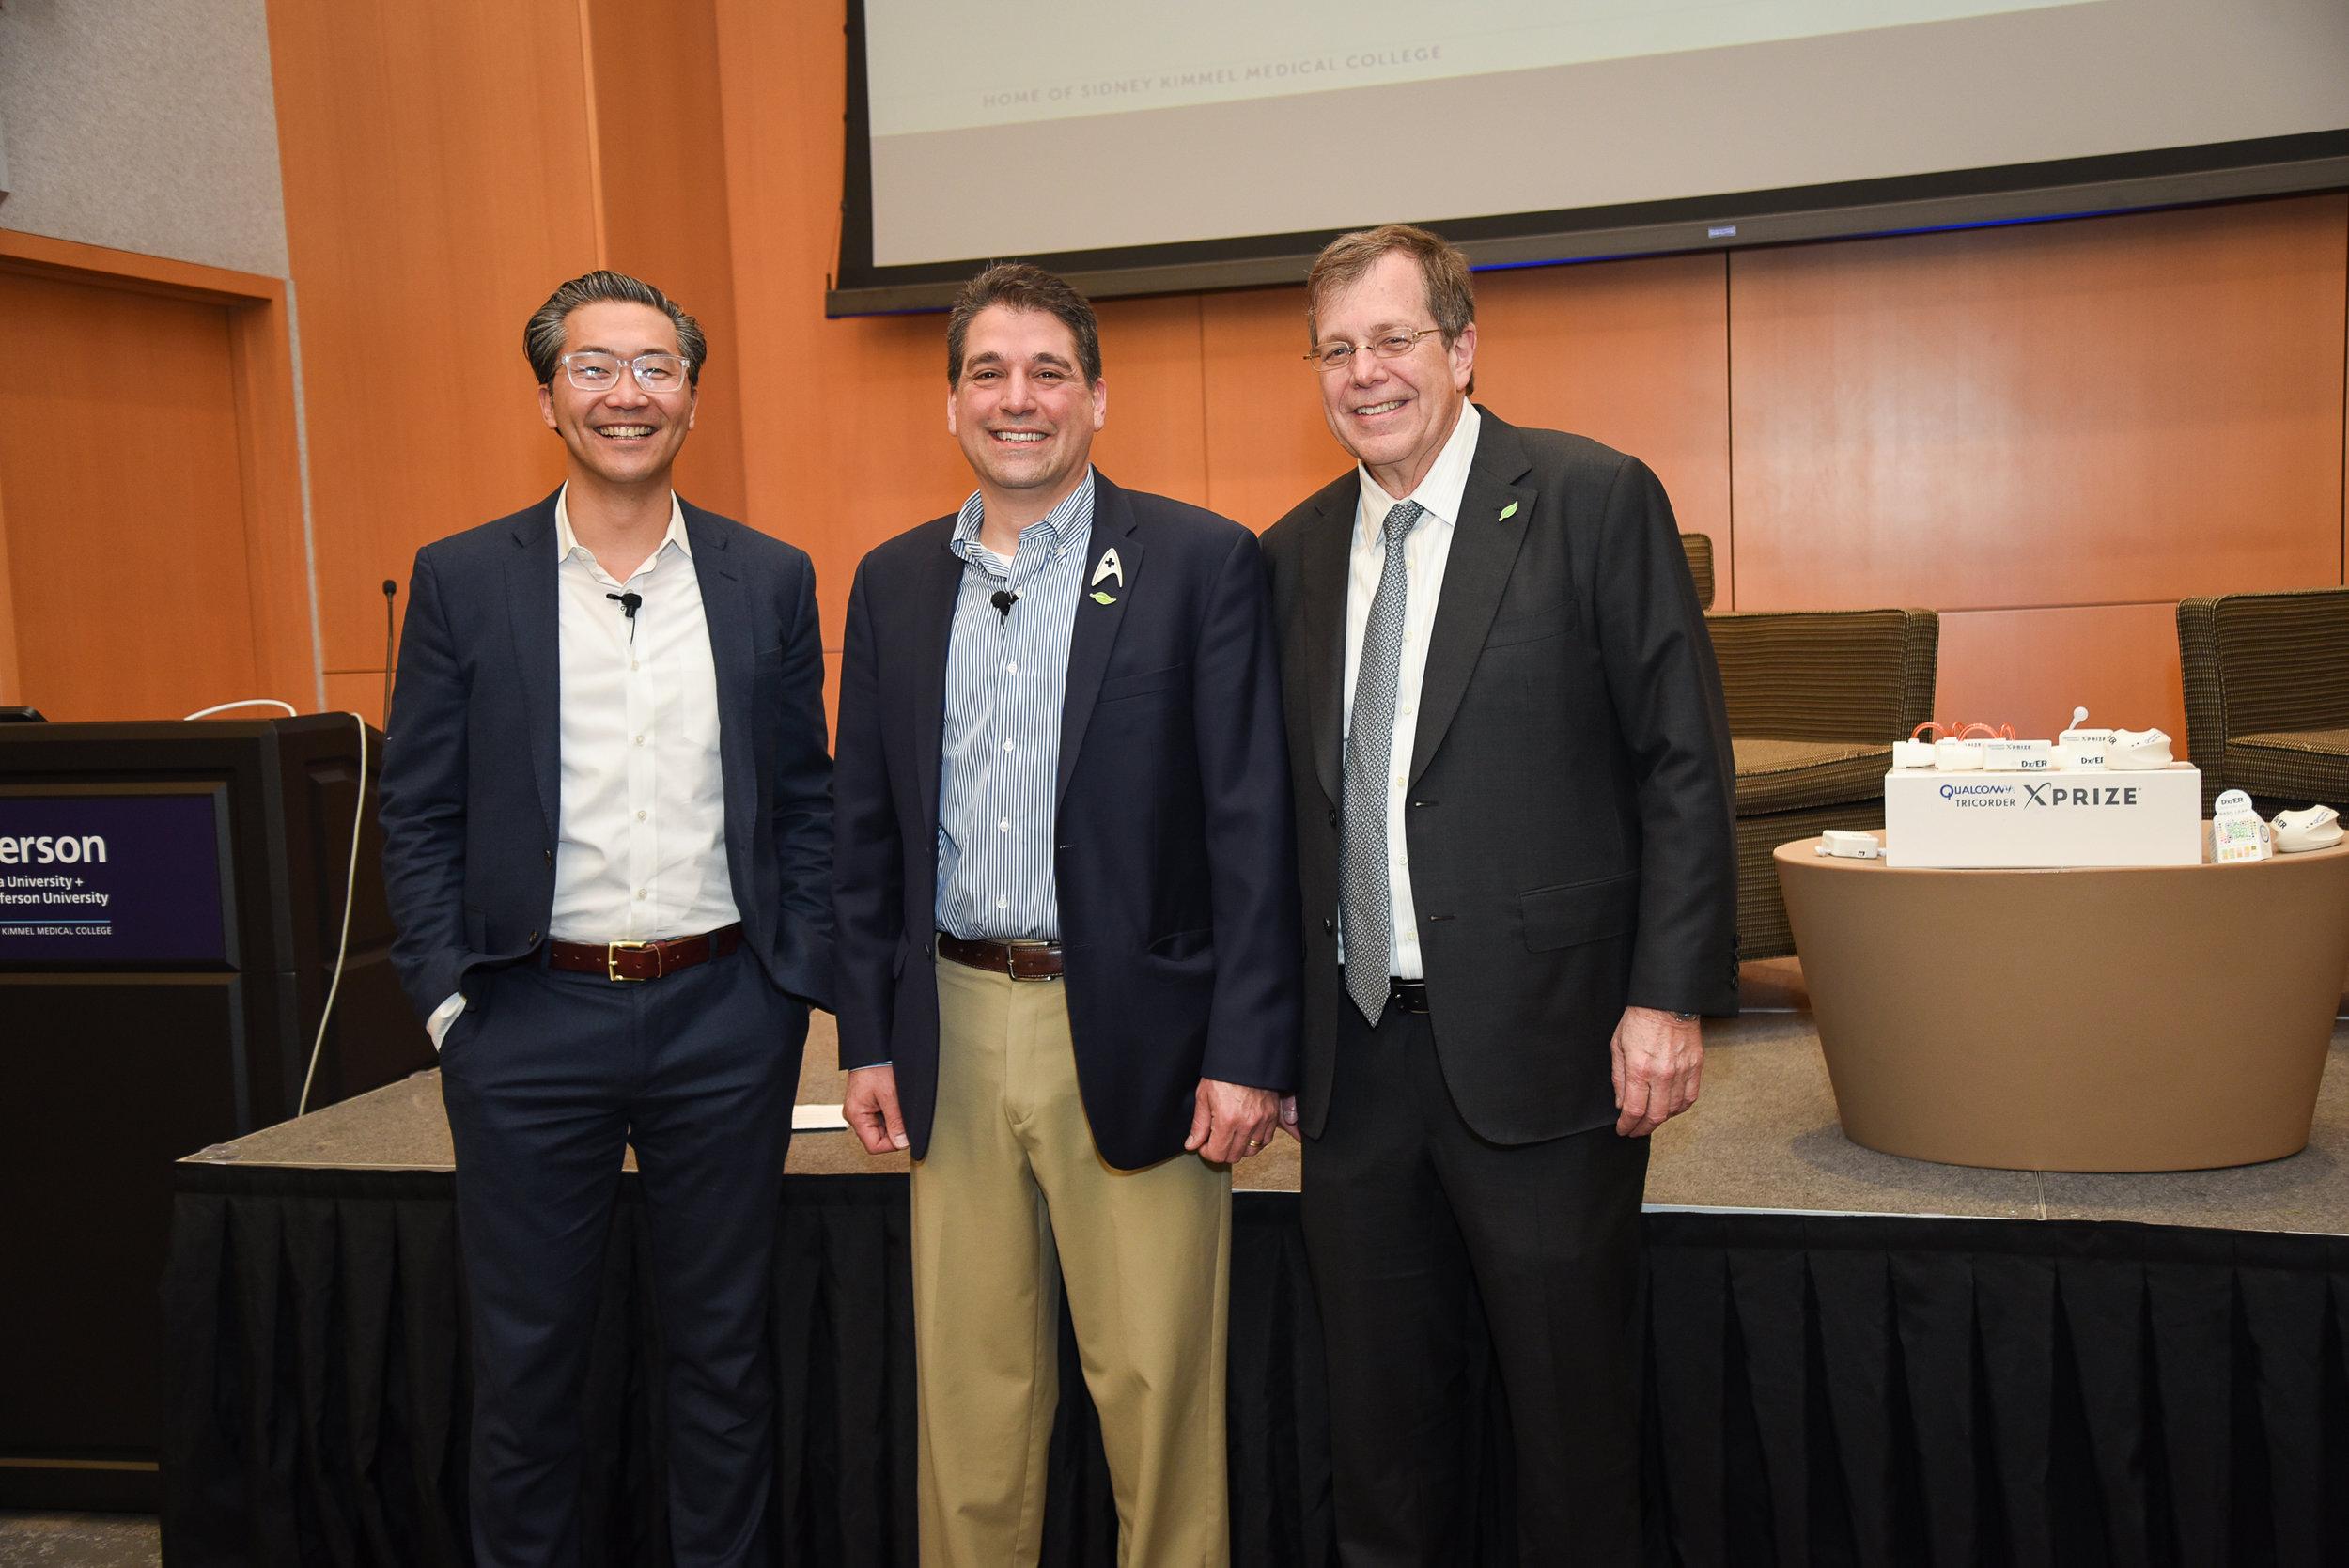 Drs. Bon Ku, Basil Harris, and Mark Tykocinski